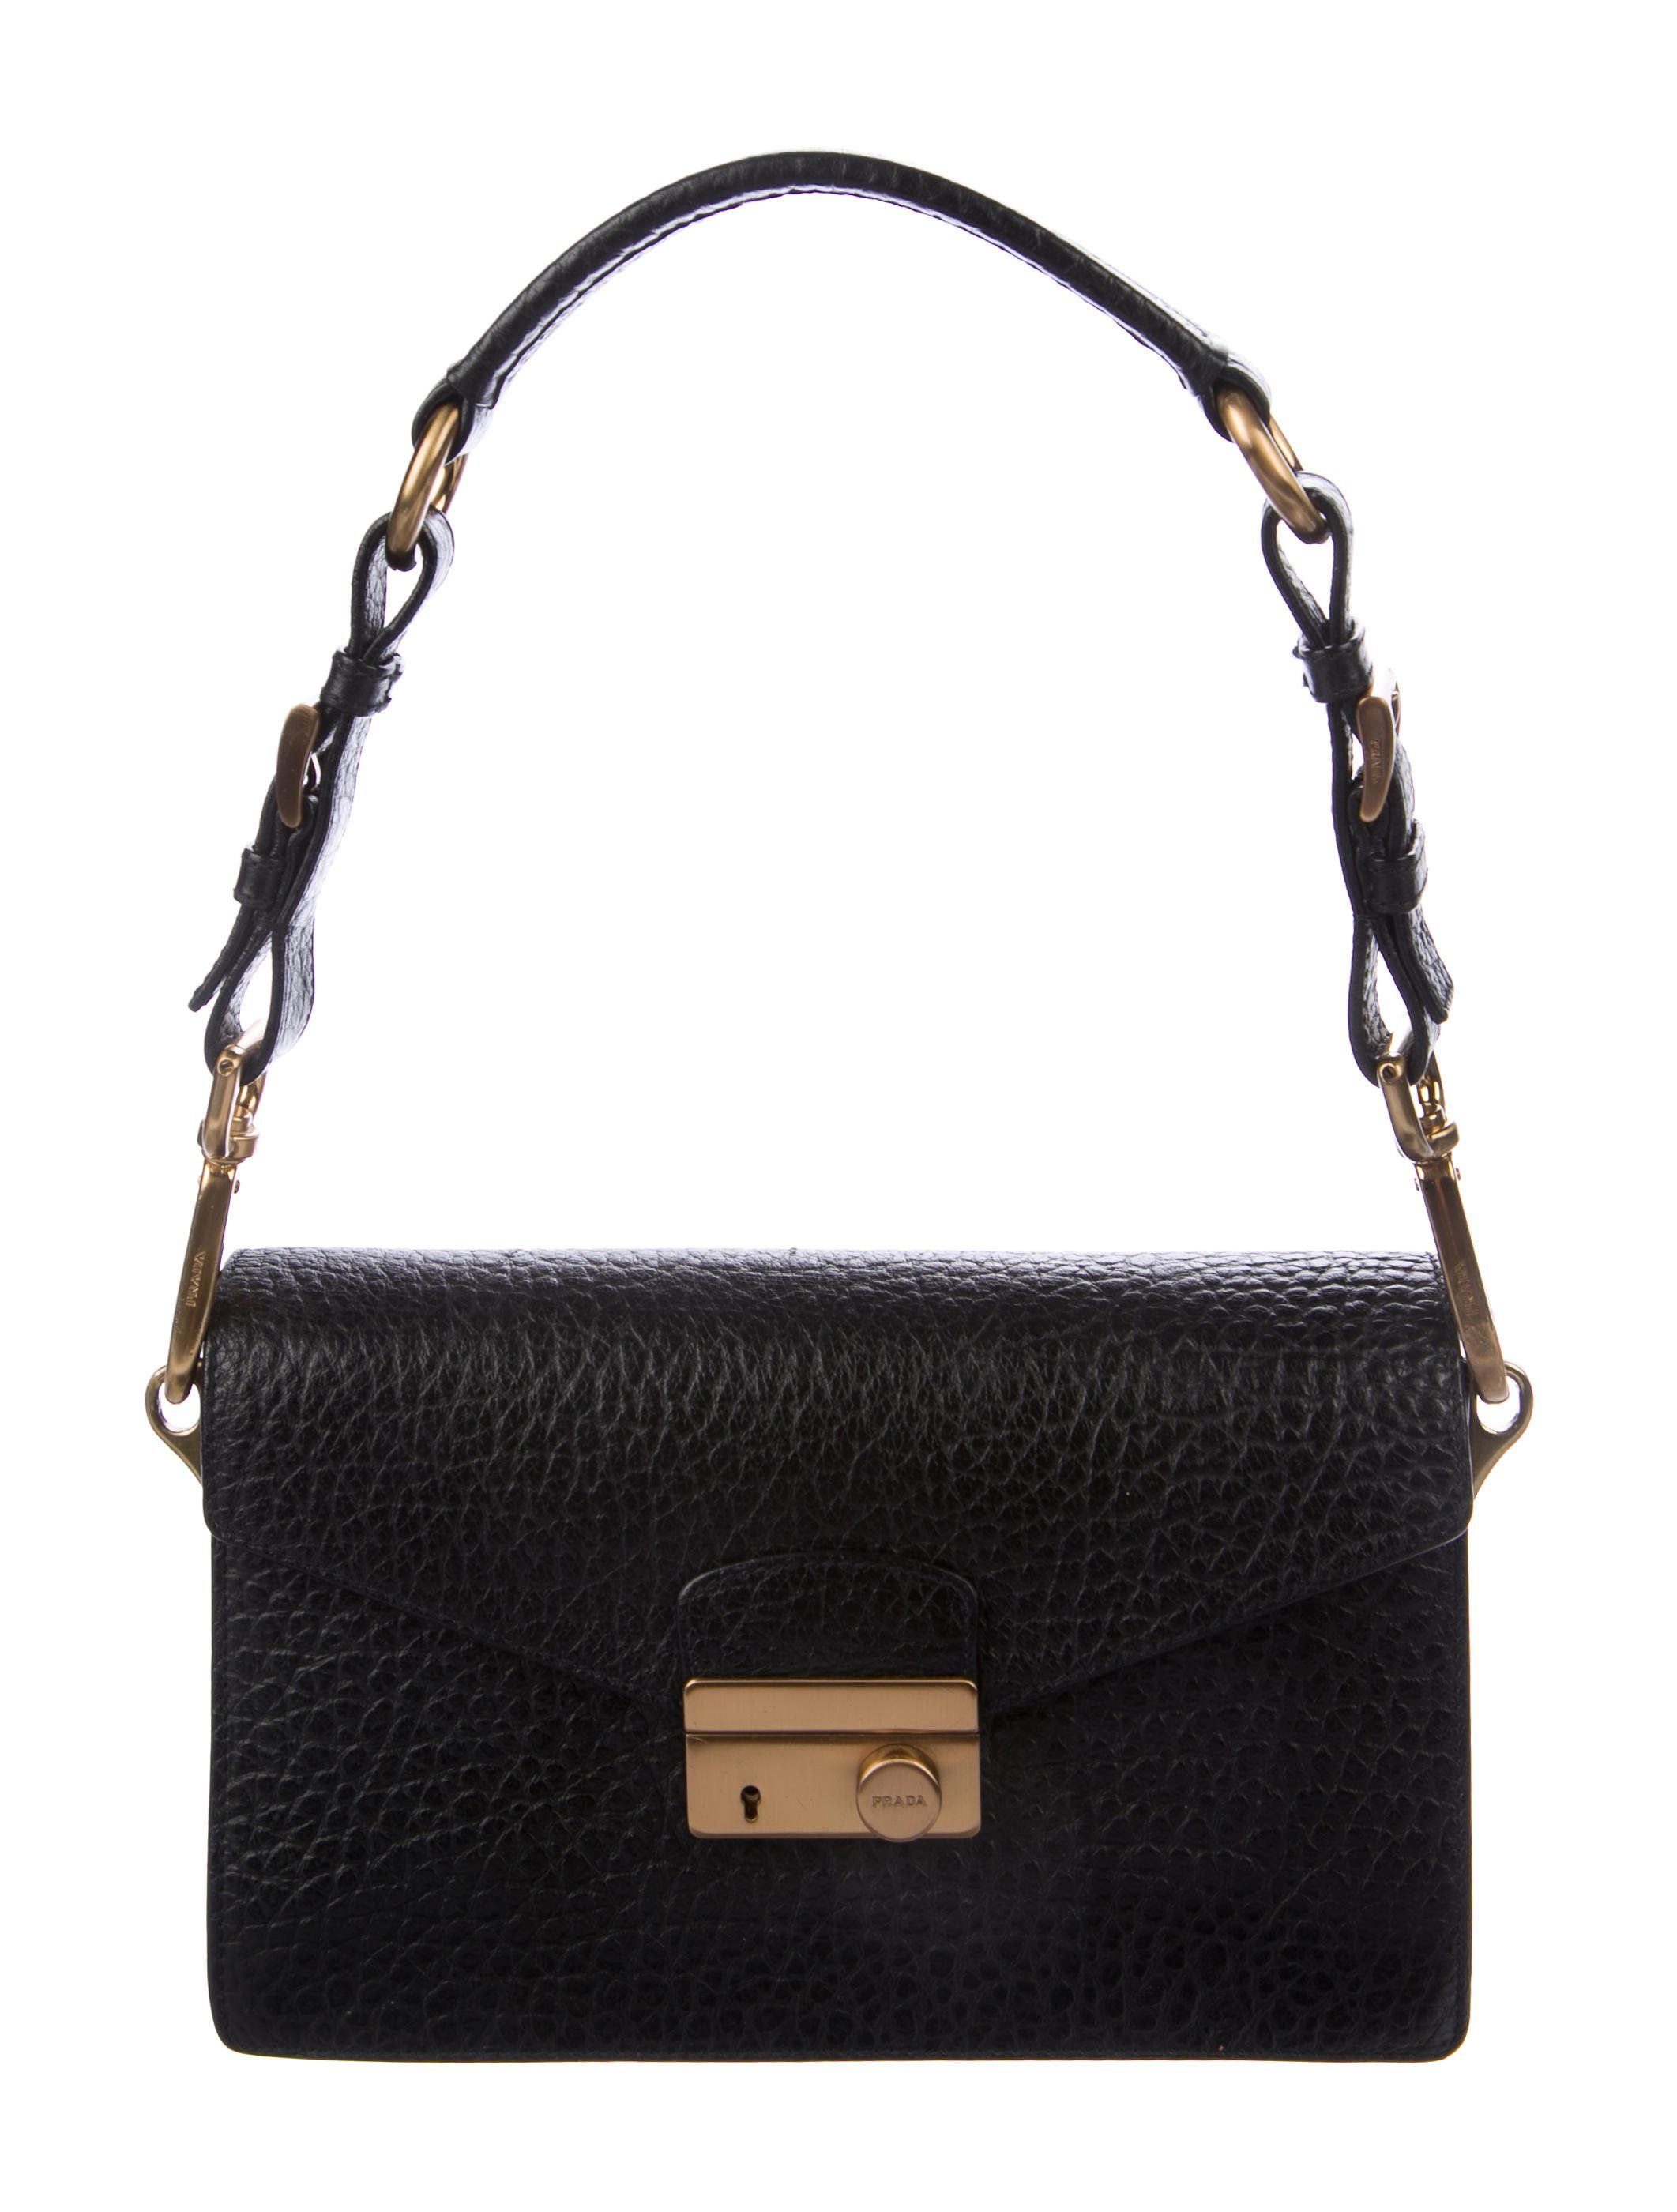 2da1169c46 Black Saffiano leather Prada Mini Sound crossbody bag with brass hardware